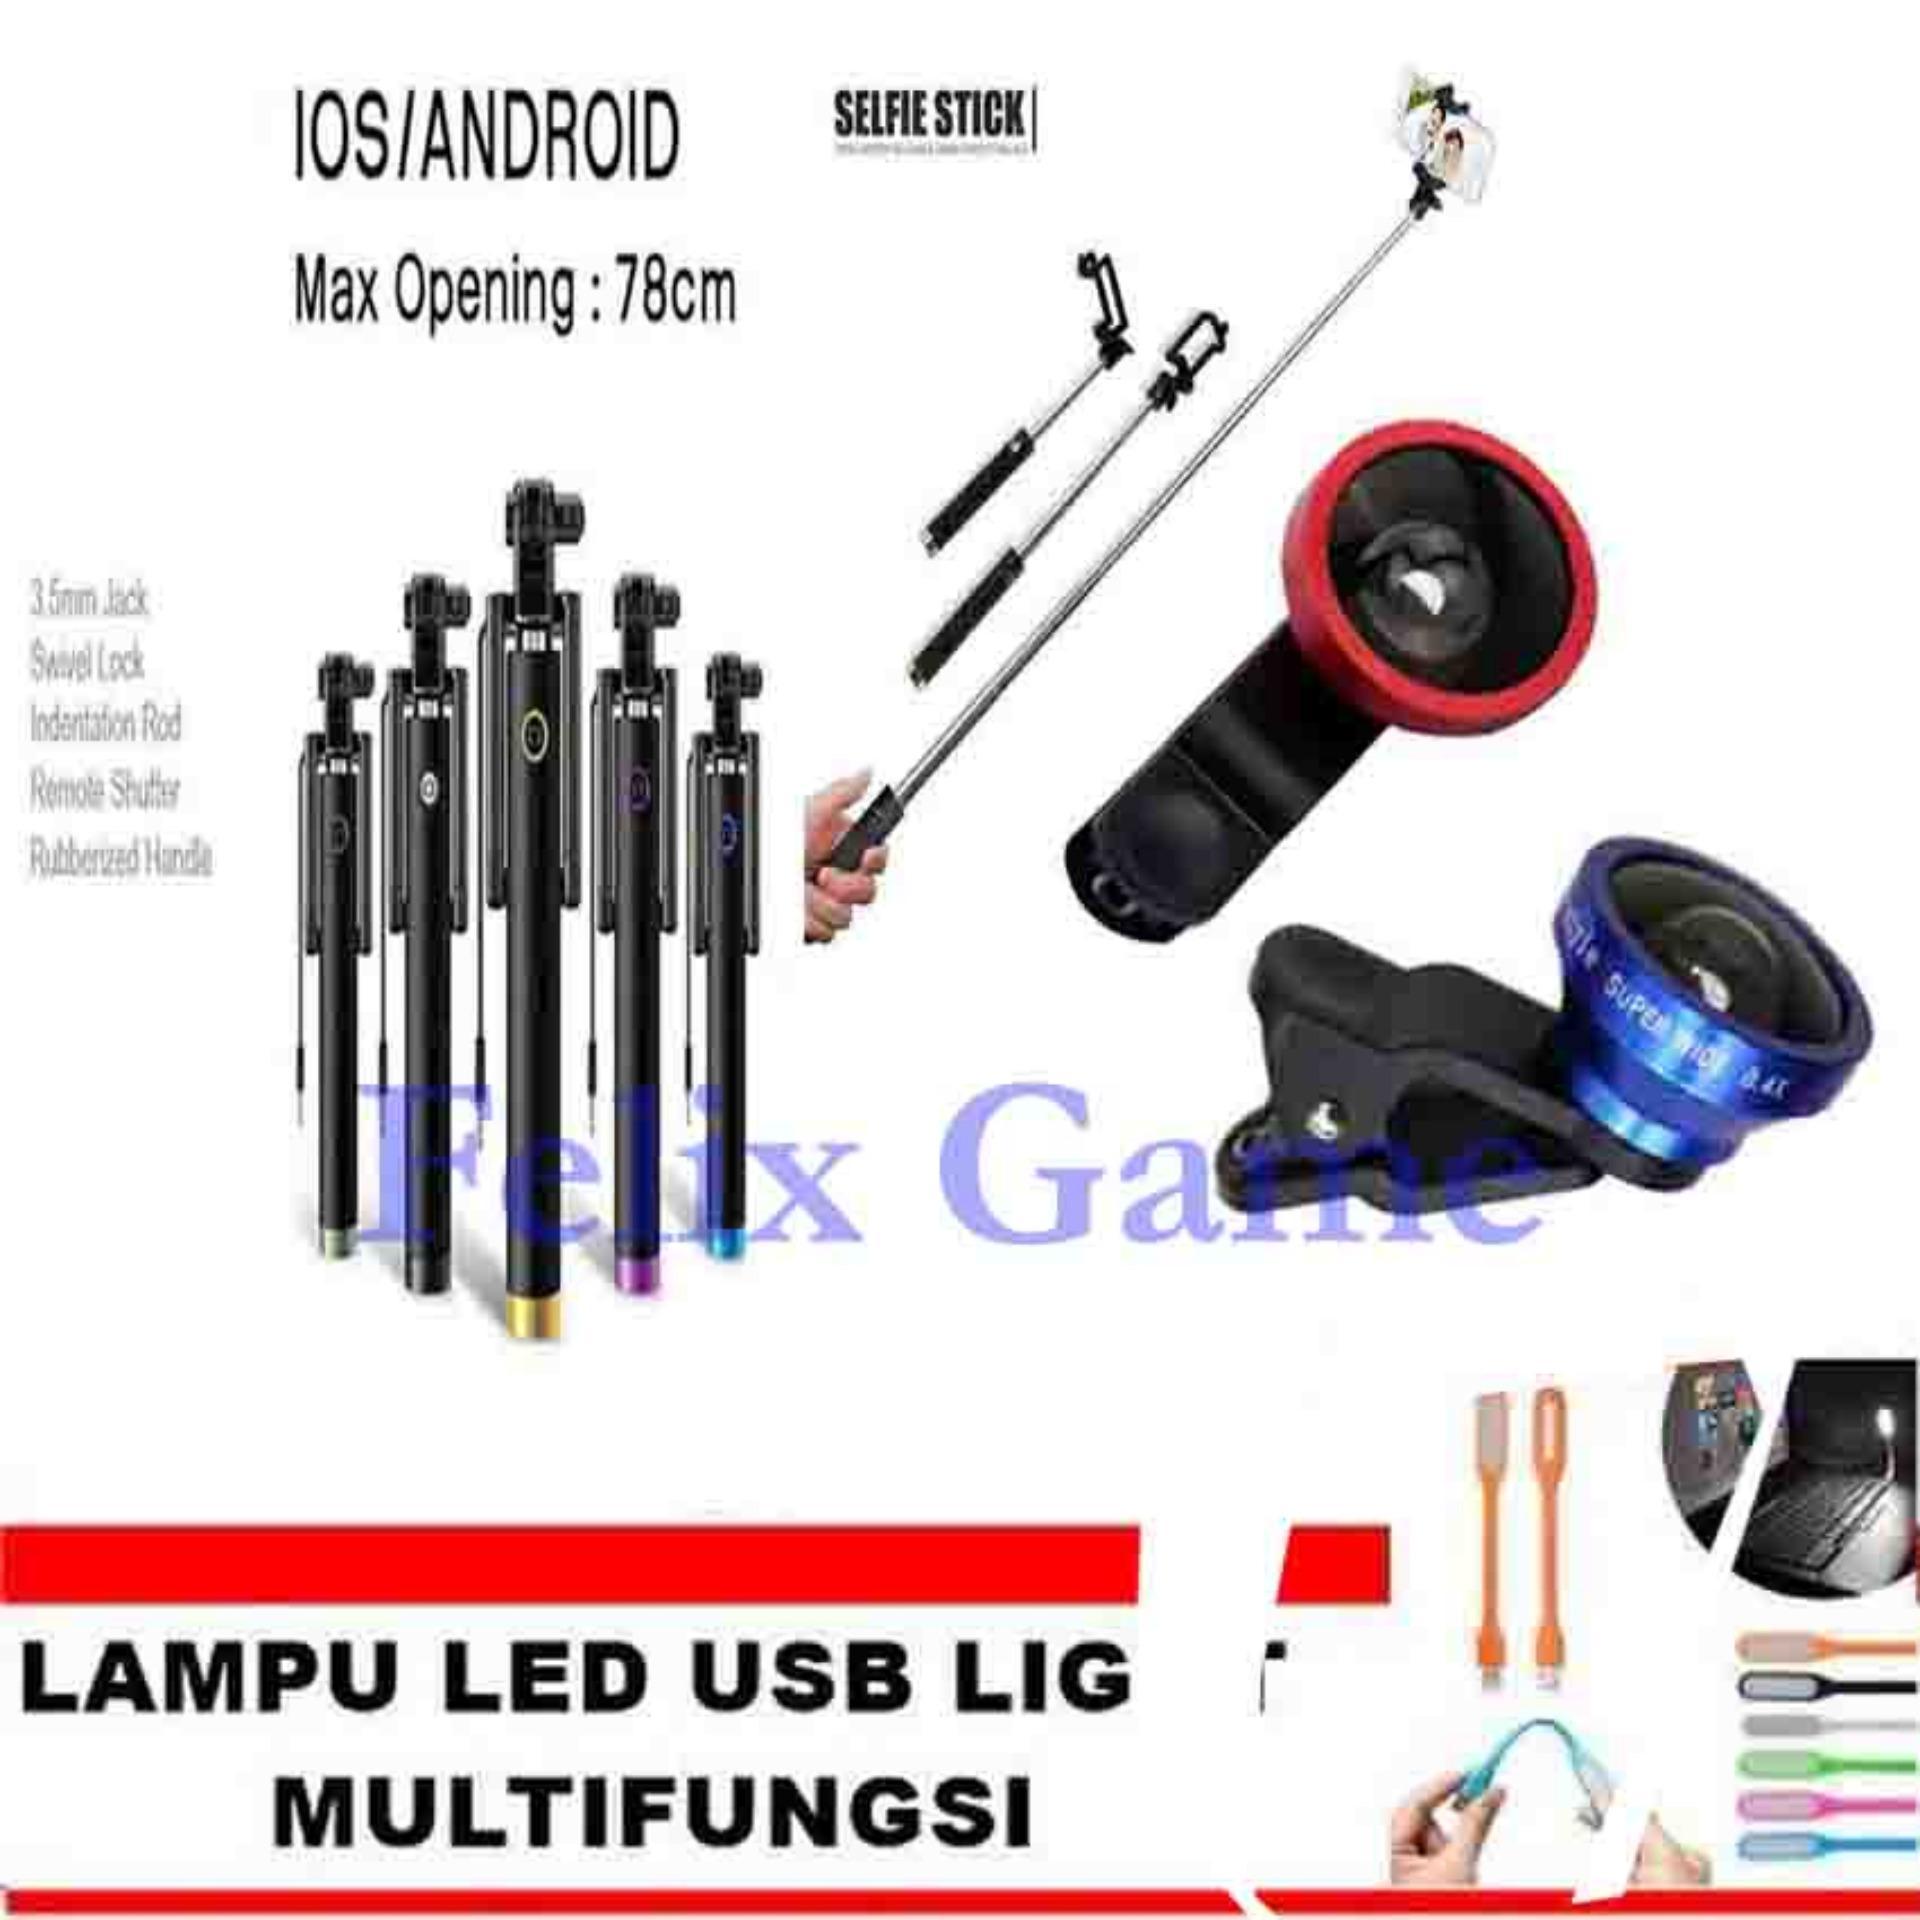 Price comparison Tongsis Monopod Kabel Black+ Lensa Super Wide 0.4 X + GRATIS LampuLED USB Lights